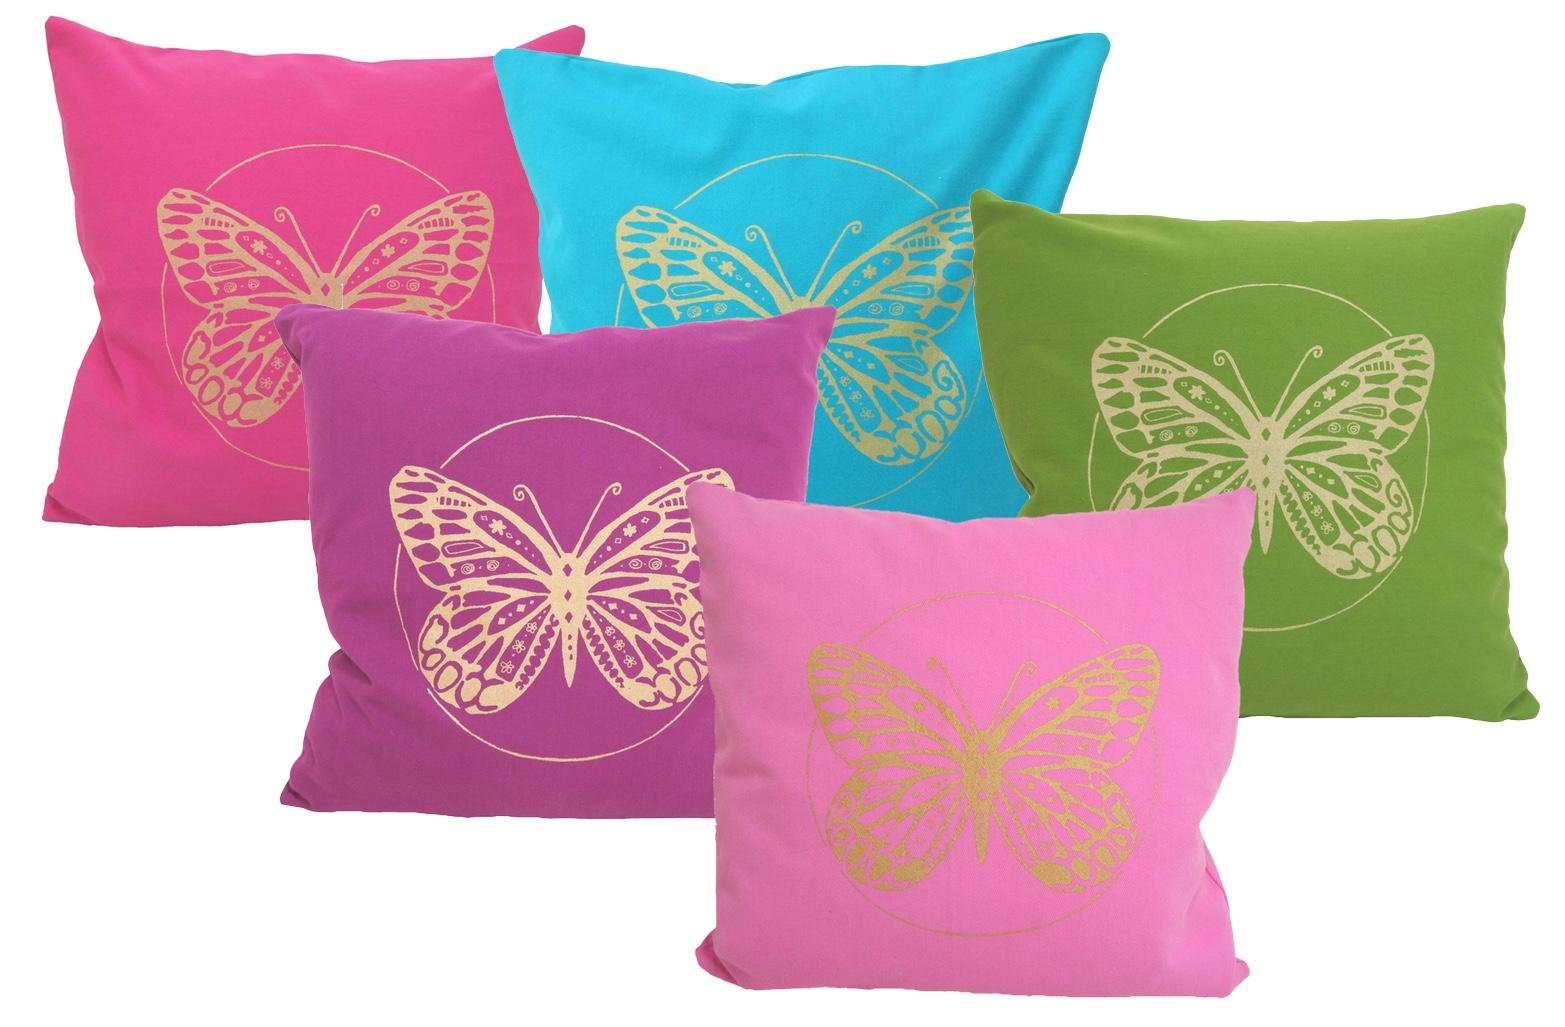 designer sofa kissen b l k linda thiele designer meditationskissen yogakissen. Black Bedroom Furniture Sets. Home Design Ideas